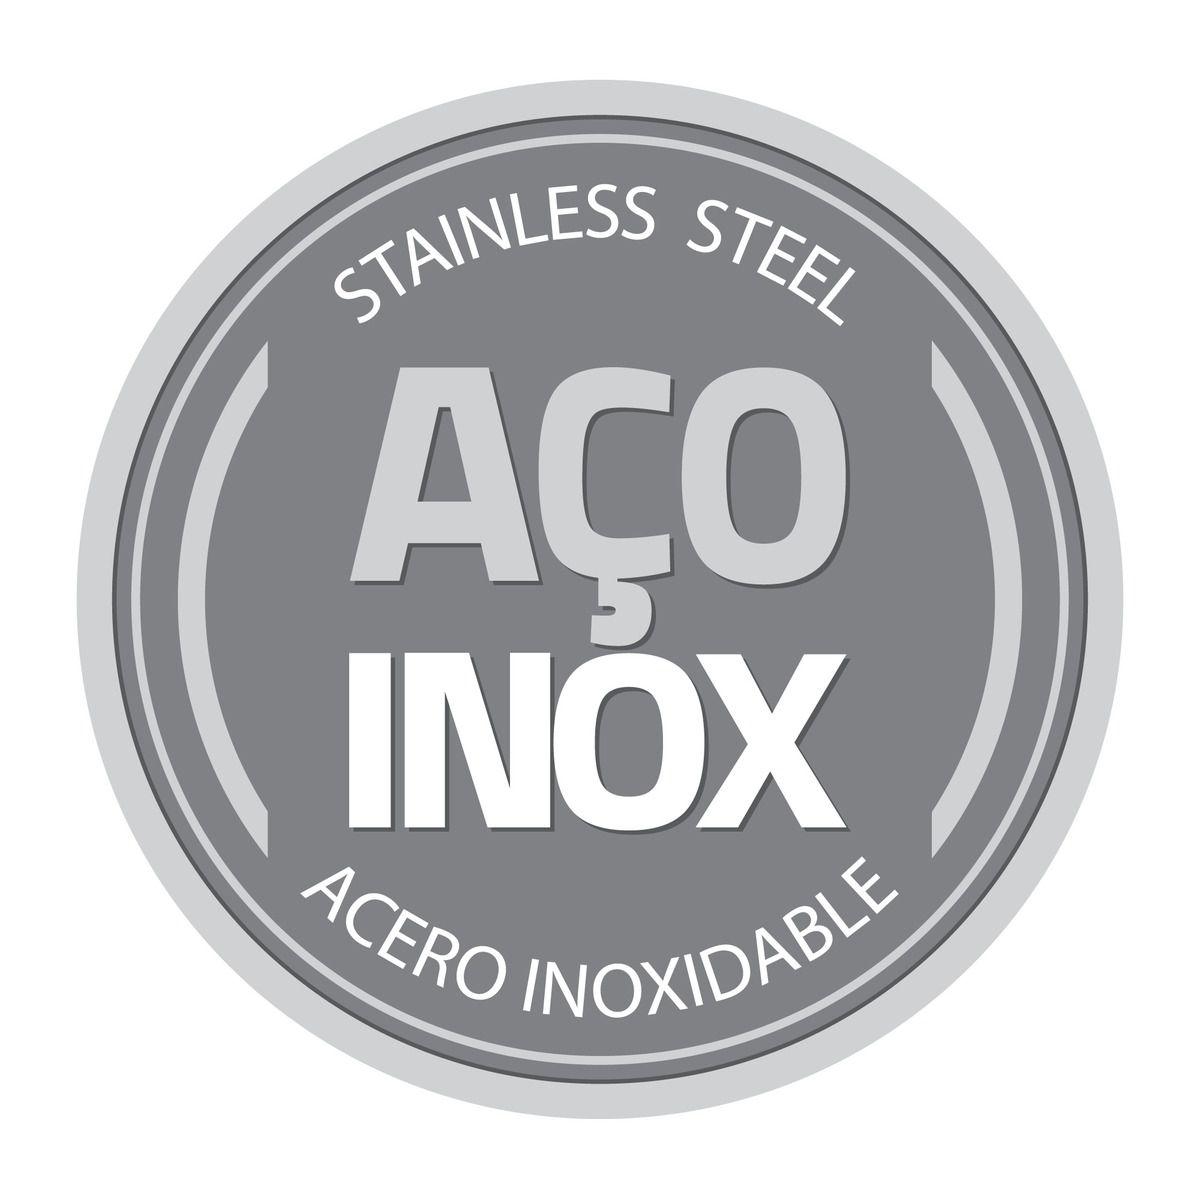 Taça para Sobremesa Tramontina Service em Aço Inox 0,15 L 61421/090 | Lojas Estrela